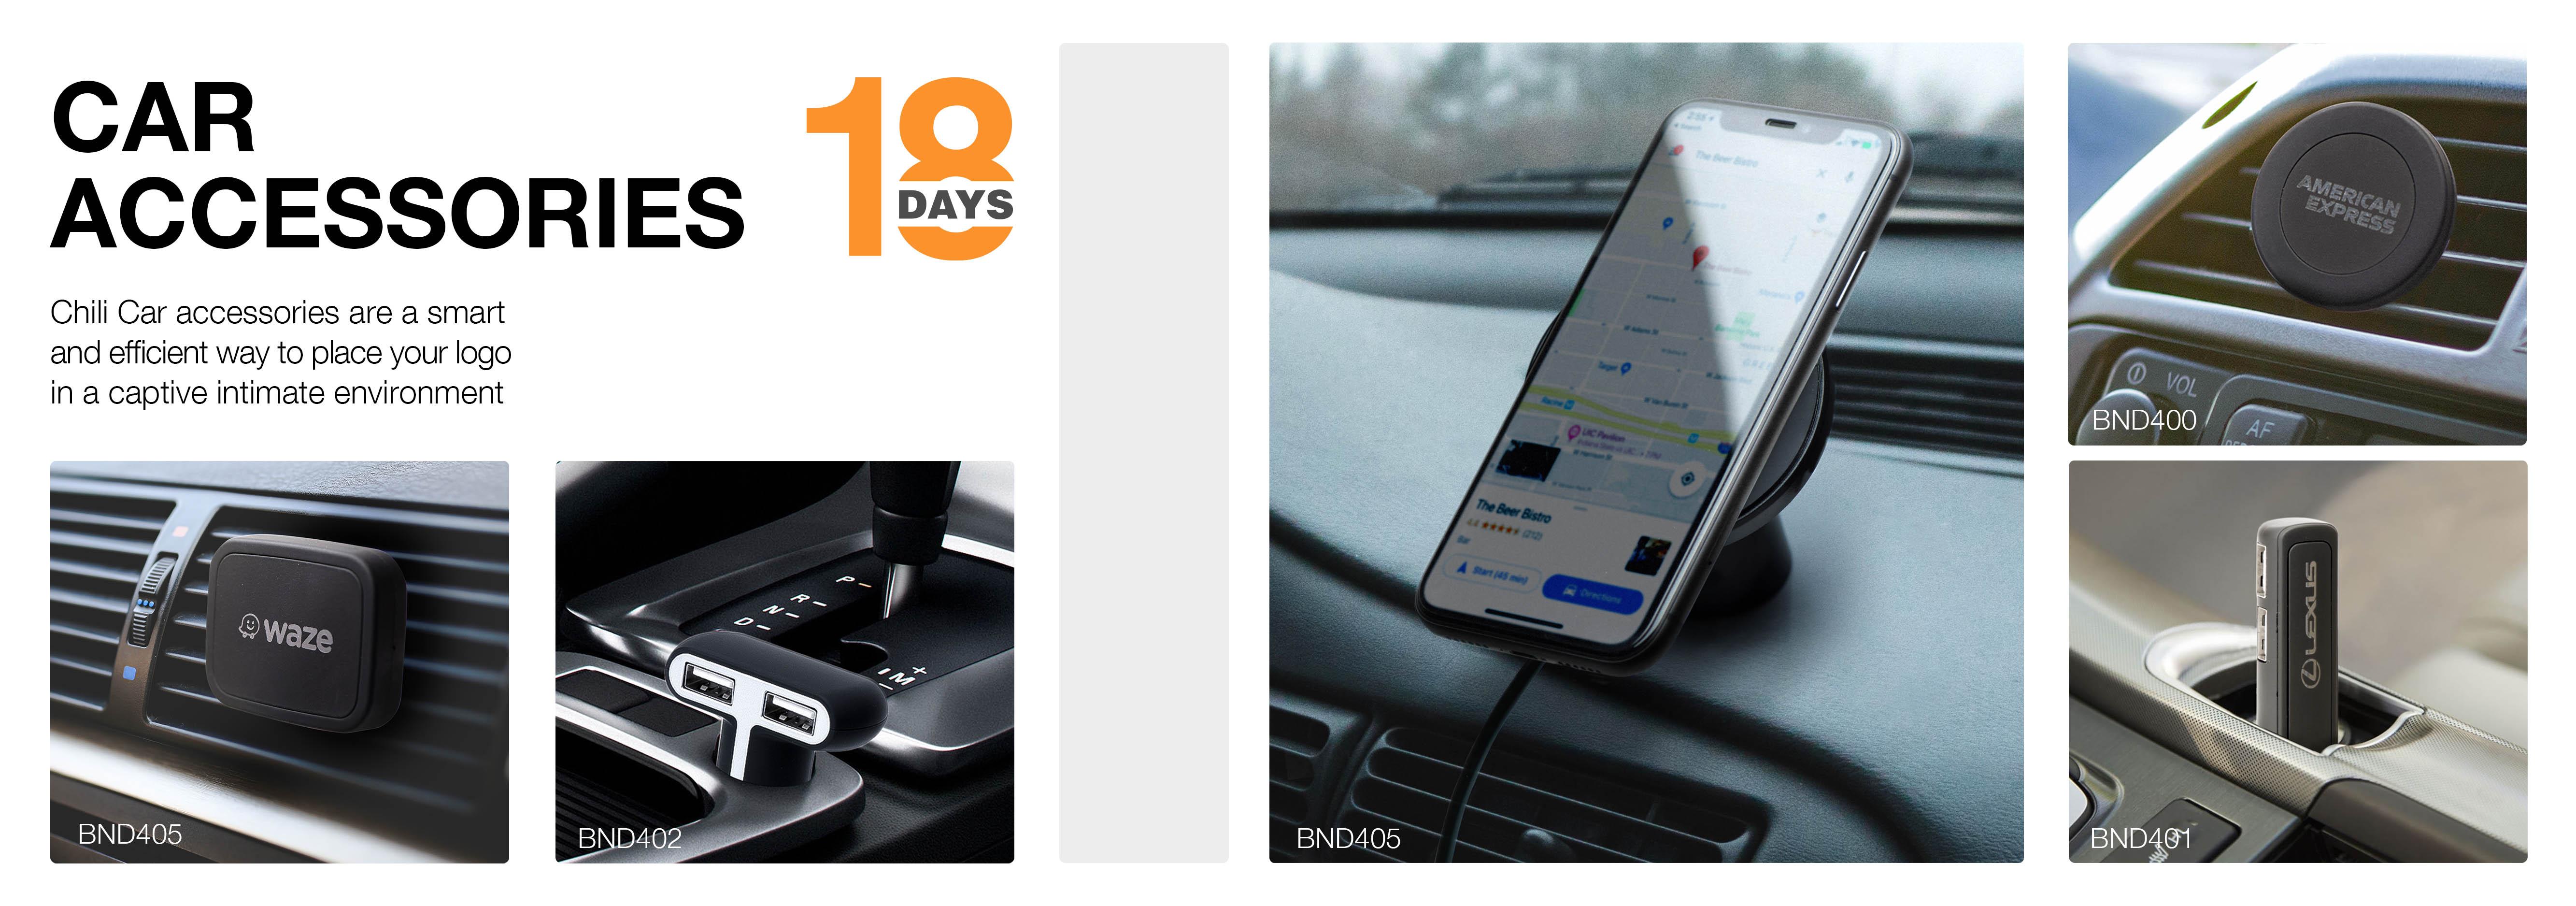 18D | CAR ACCESSORIES